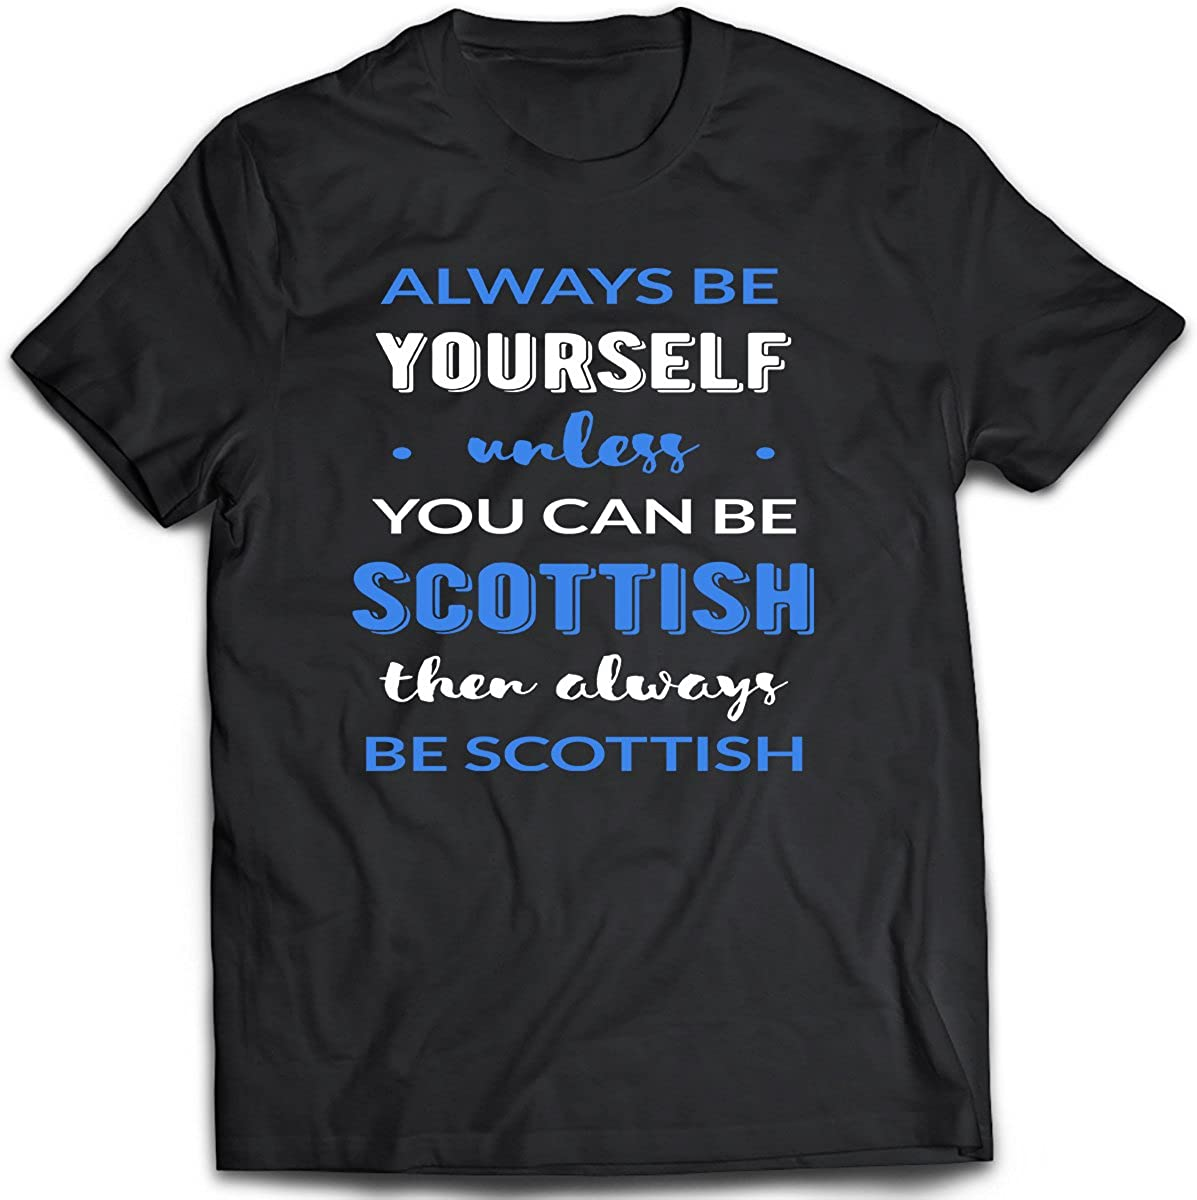 District Shirts Scottish Unisex T-Shirt. Funny Scottish Tee Idea. Shirt for Scottish